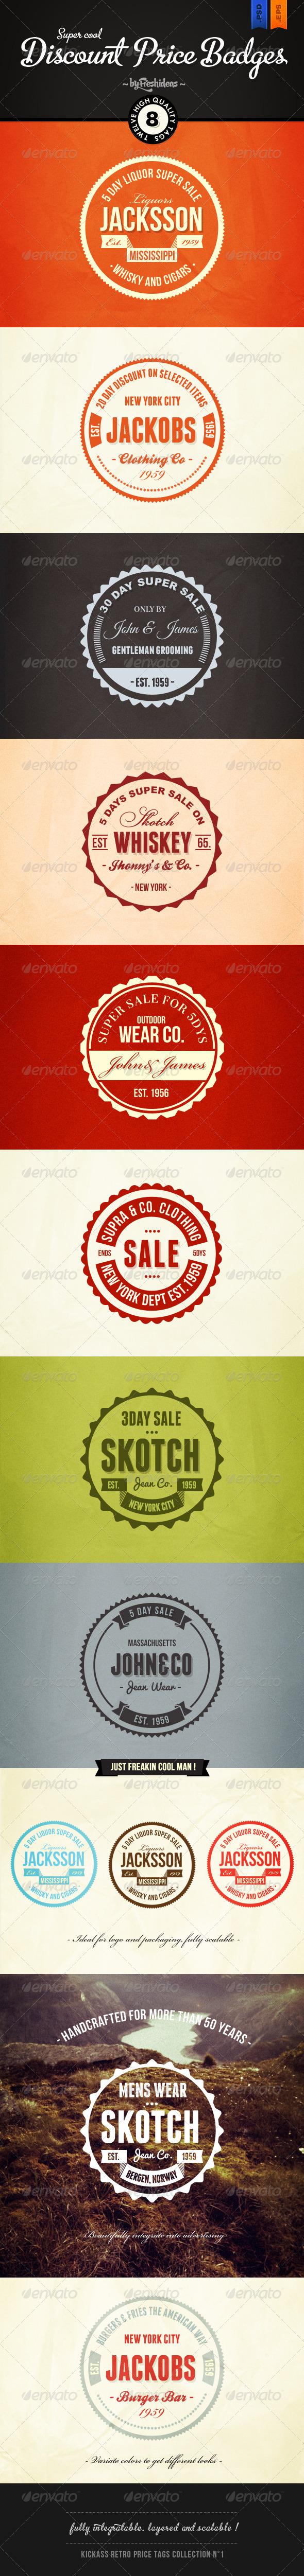 GraphicRiver Retro Price Badges 3995389